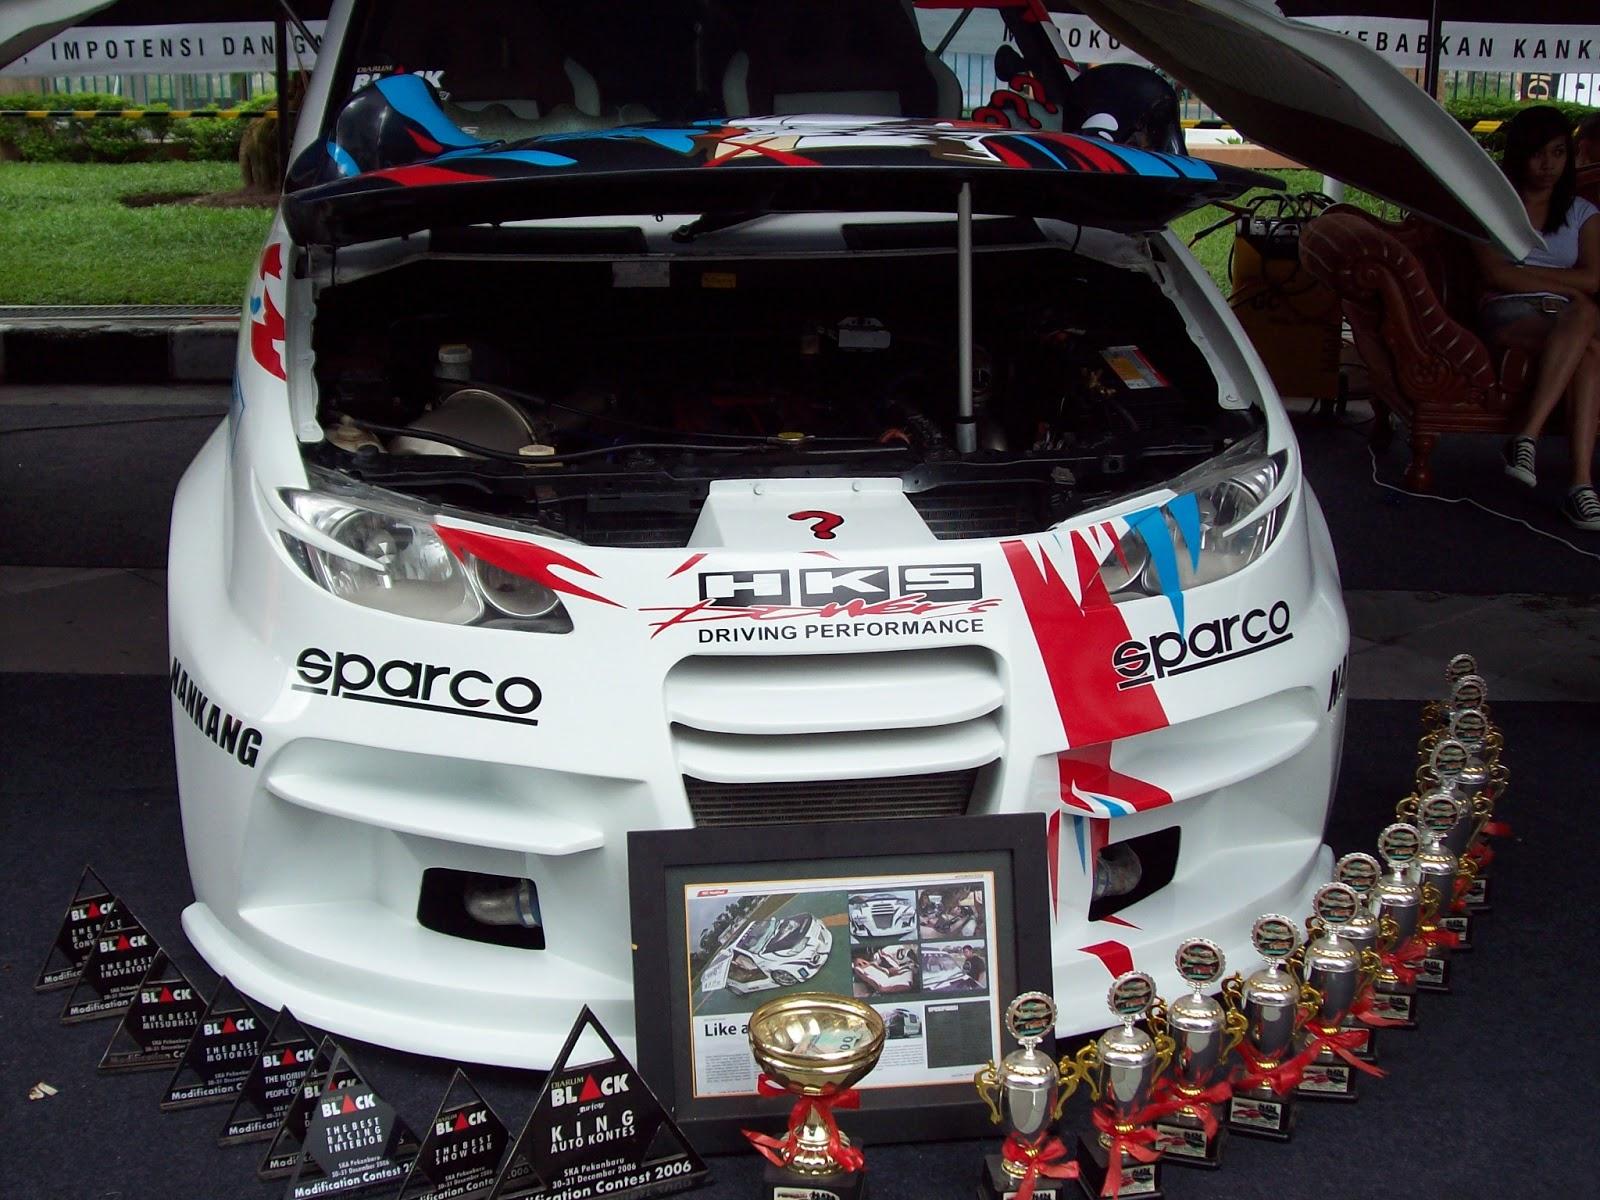 black auto contest modifikasi pekanbaru title=